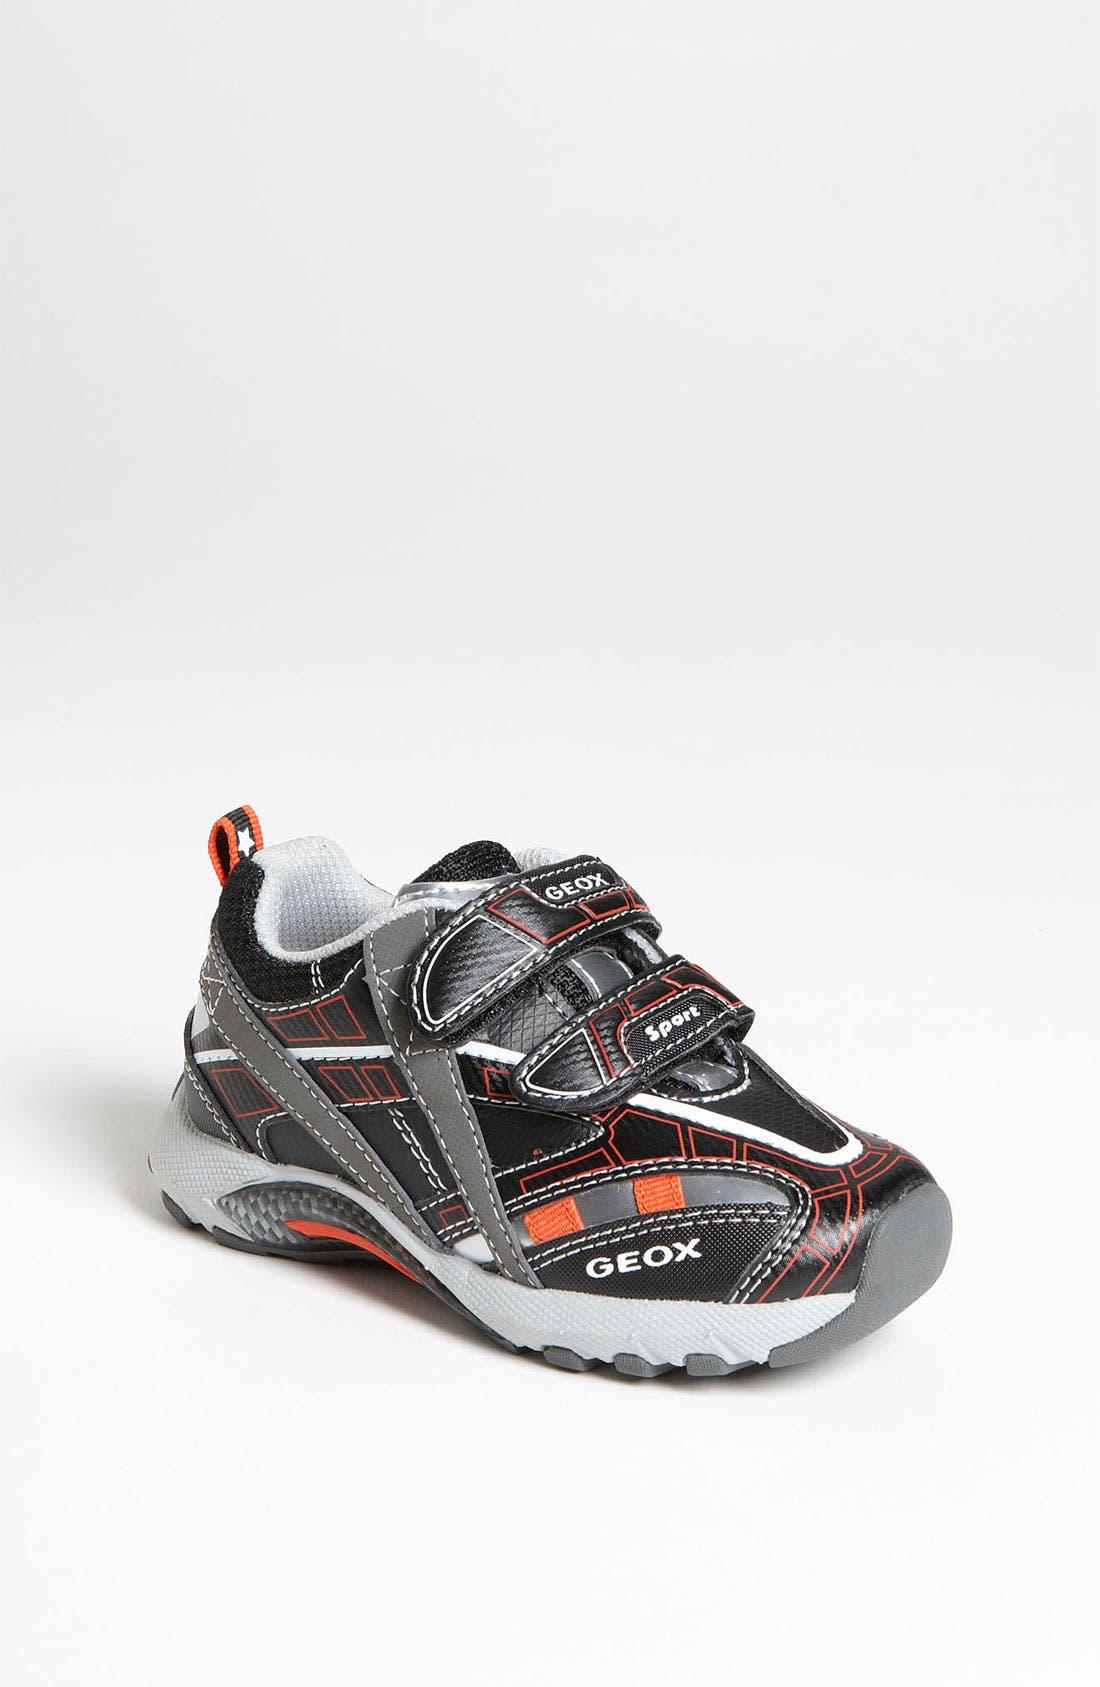 Main Image - Geox 'Stark' Sneaker (Walker & Toddler)